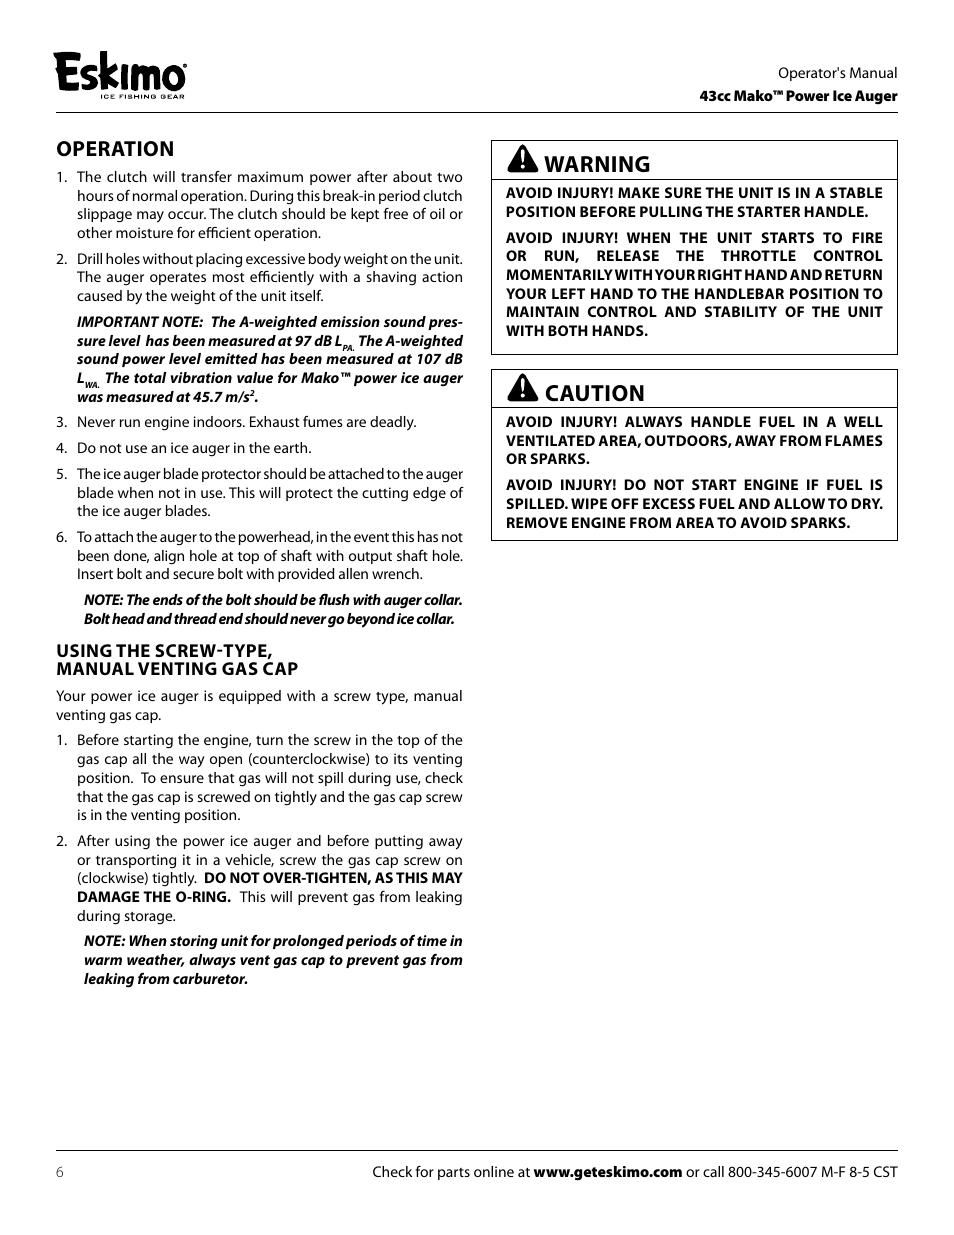 Caution, Warning, Operation | Eskimo S33Q8 Manuel d